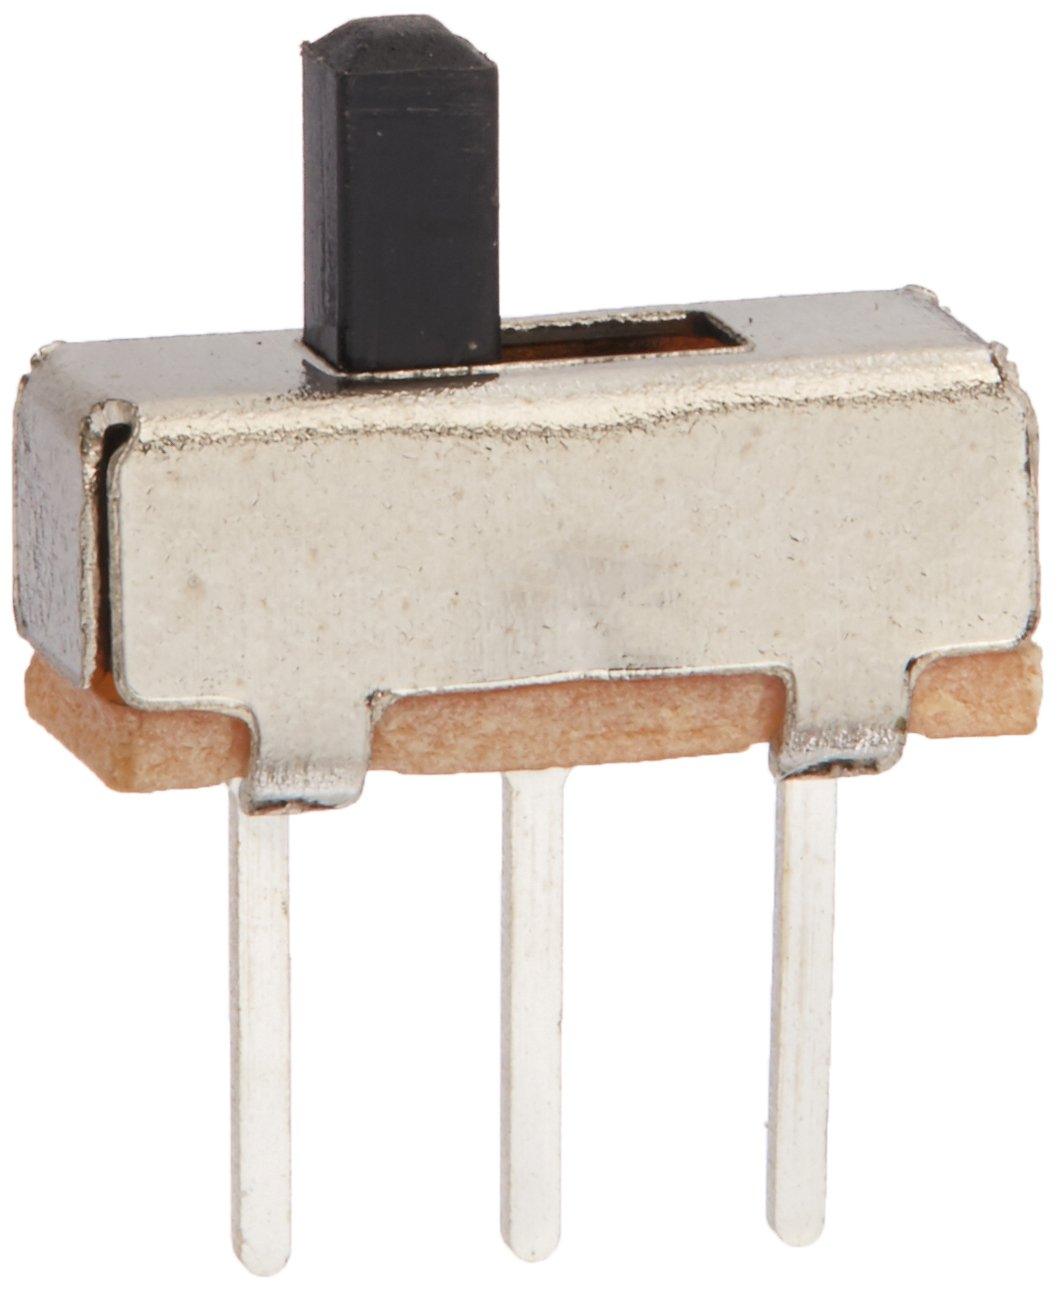 Sourcingmap A12013100UX0116 - Pack de 50 interruptores deslizantes